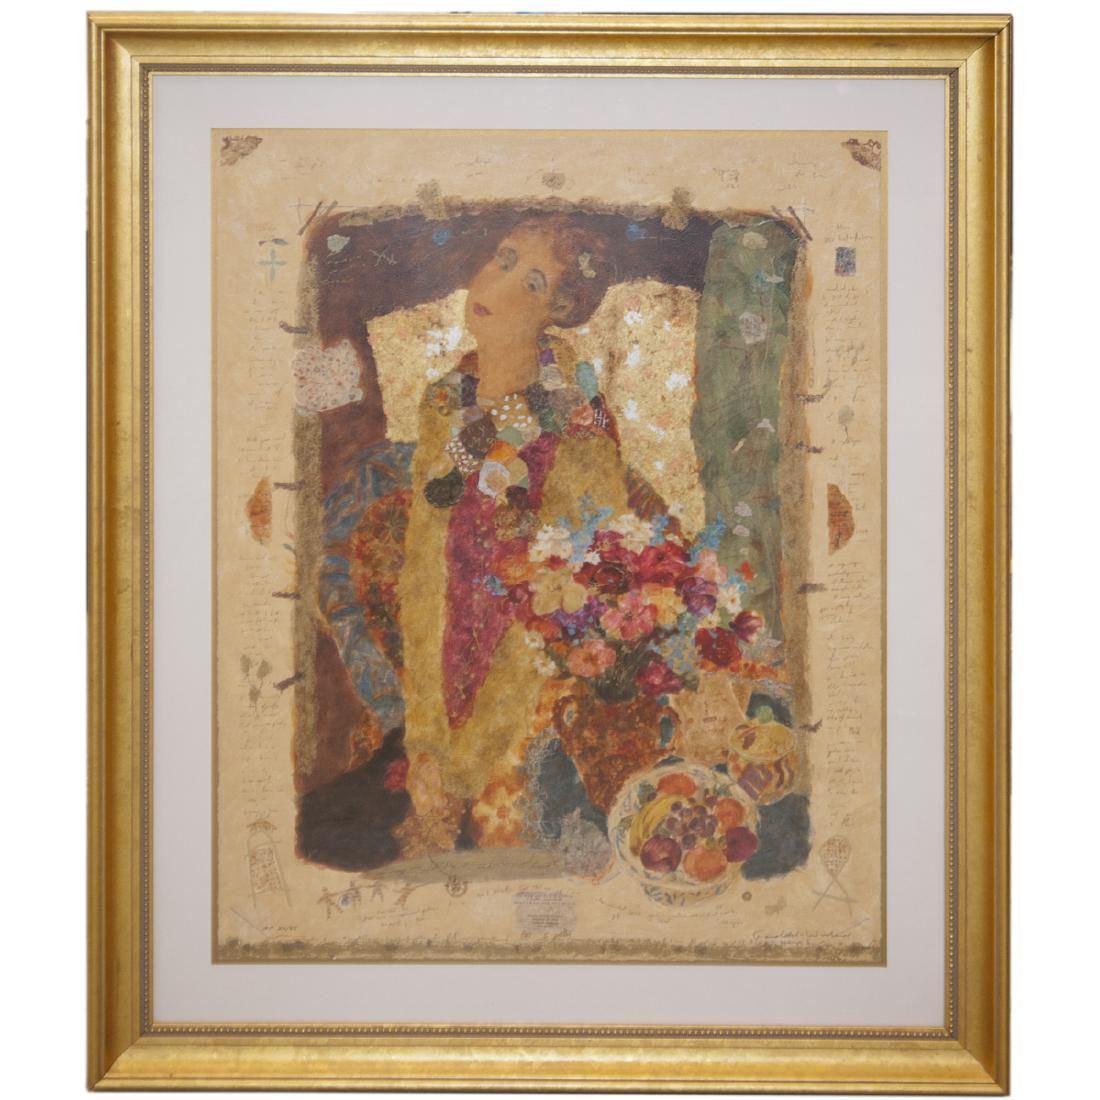 Roy Fairchild-Woodard (English b. 1953) Artist Proof